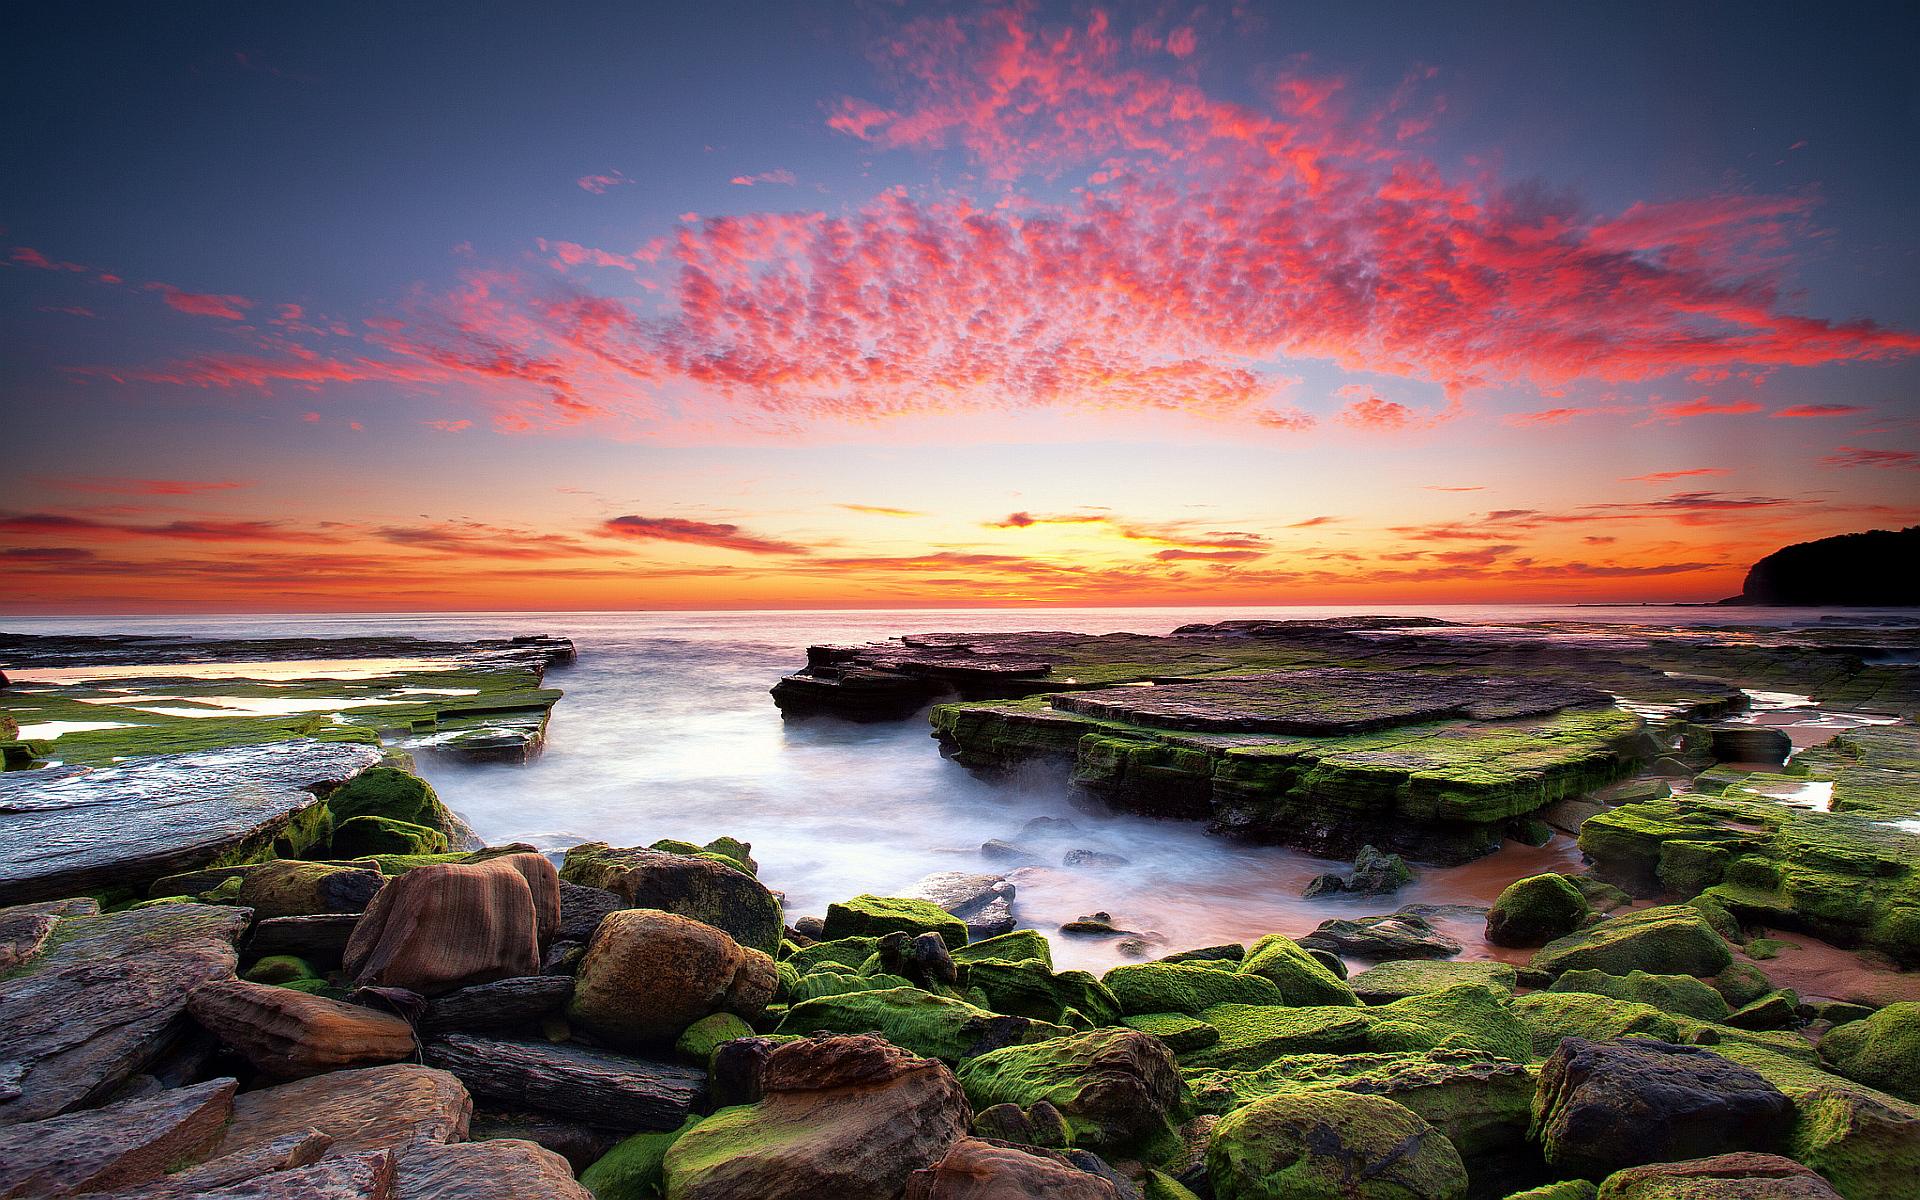 sunset coastal - HD Desktop Wallpapers | 4k HD